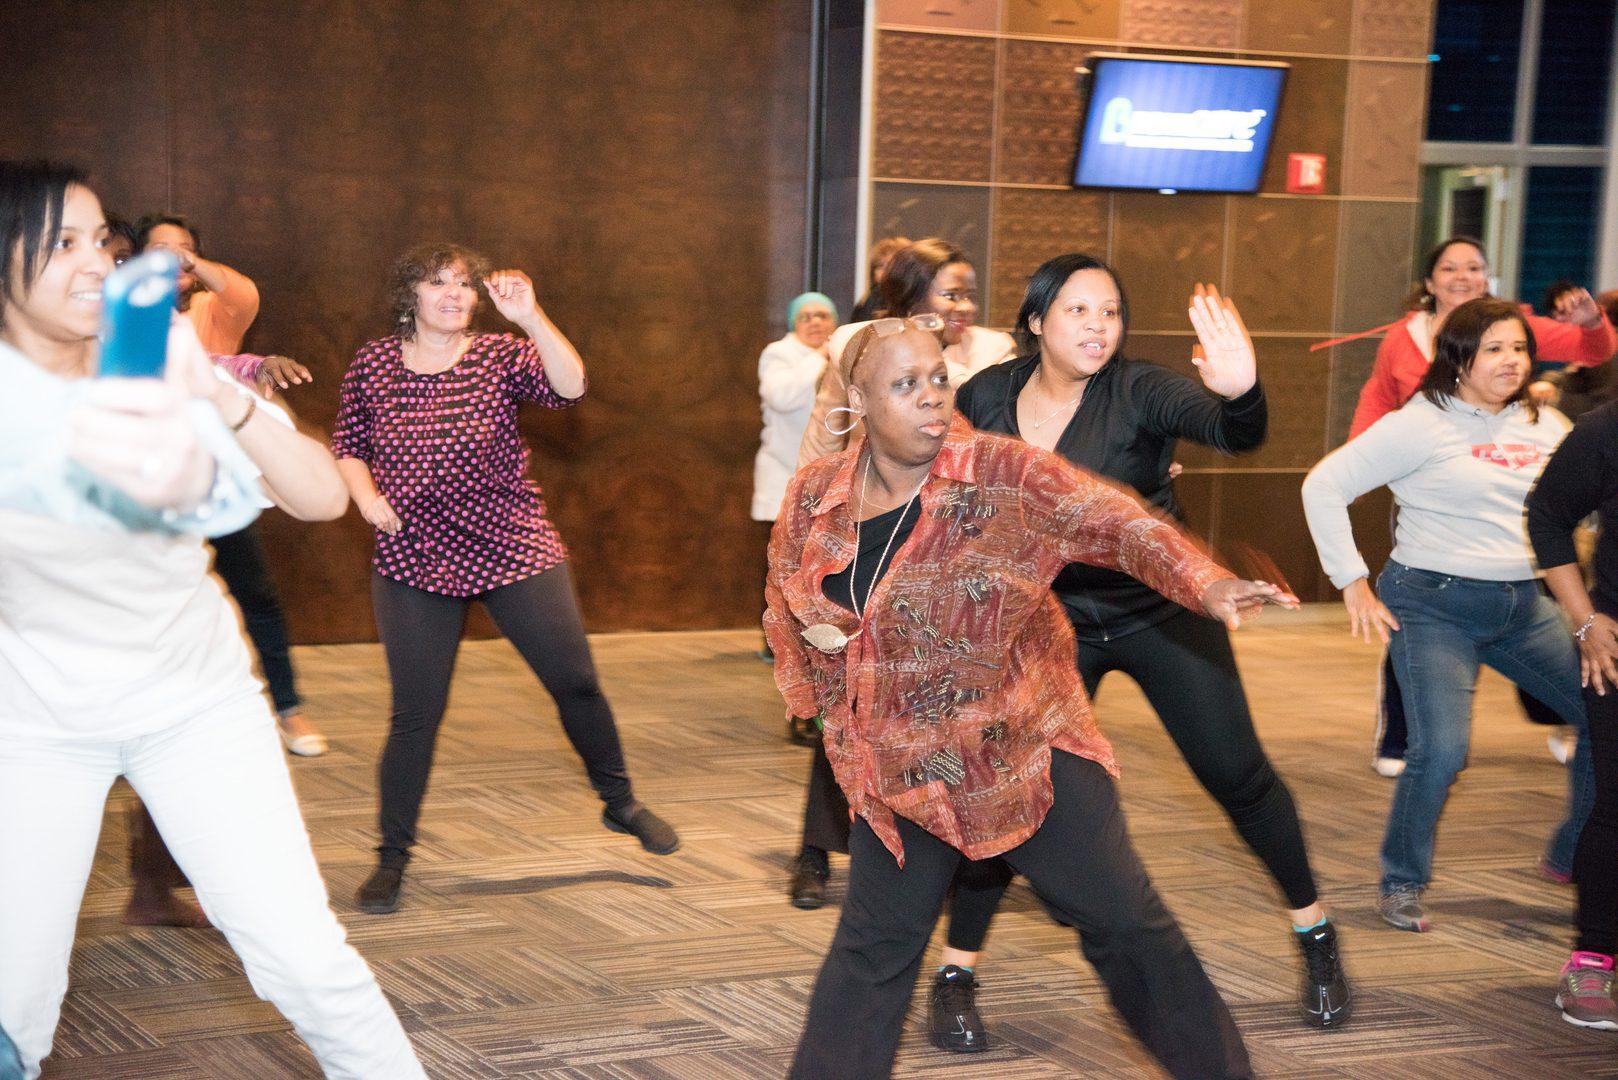 Women following dance moves